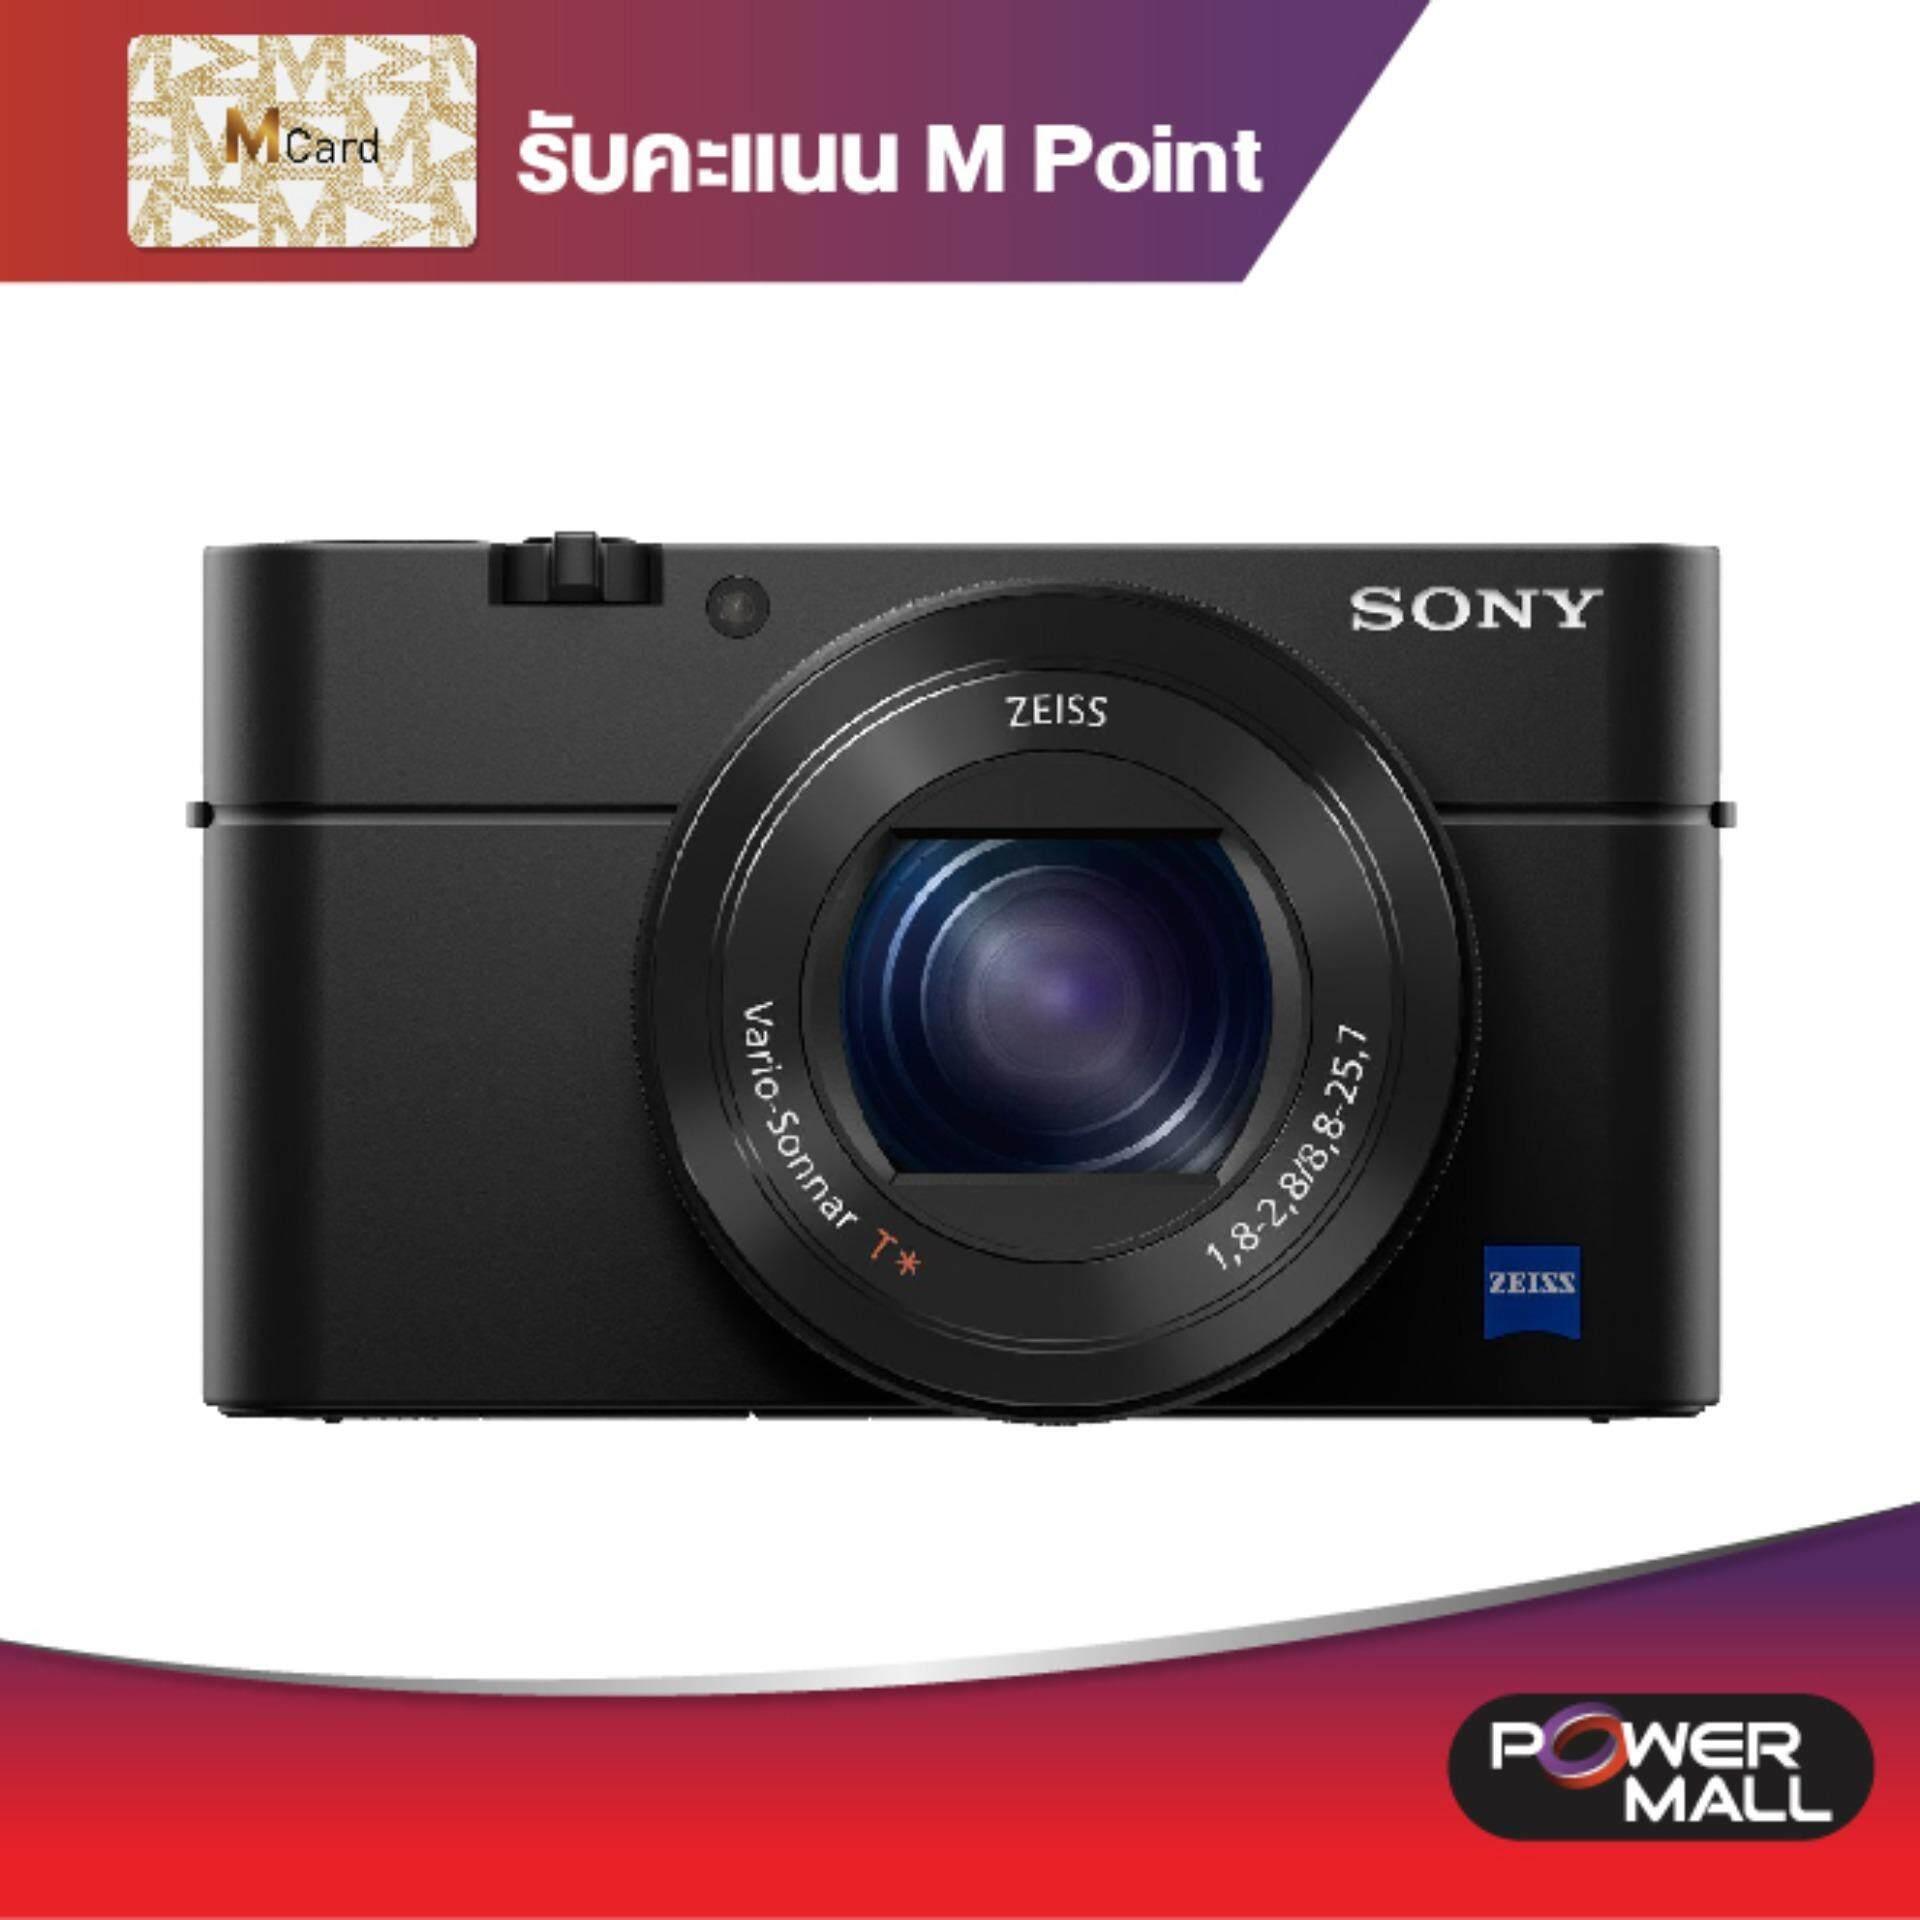 Sony Cybershot Dsc-Rx100m4 Compact Digital Camera 20.1mp With Lens24-70 Mm,40x Super Slow Motion(free: Sdxc 64gb+ Screenprotector+camera Bag).